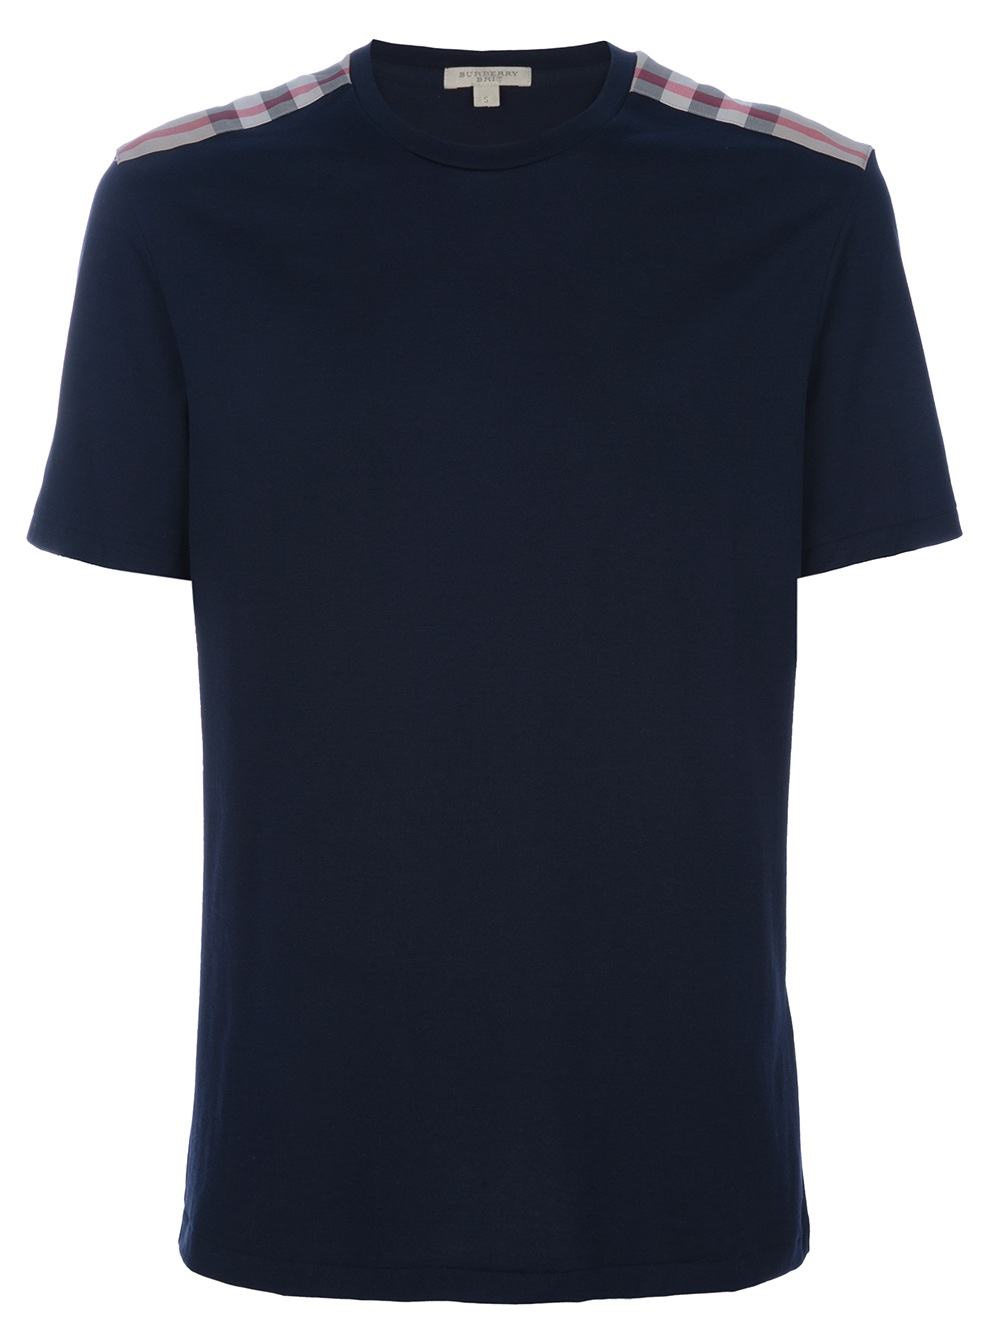 burberry brit check detail t shirt in black for men lyst. Black Bedroom Furniture Sets. Home Design Ideas